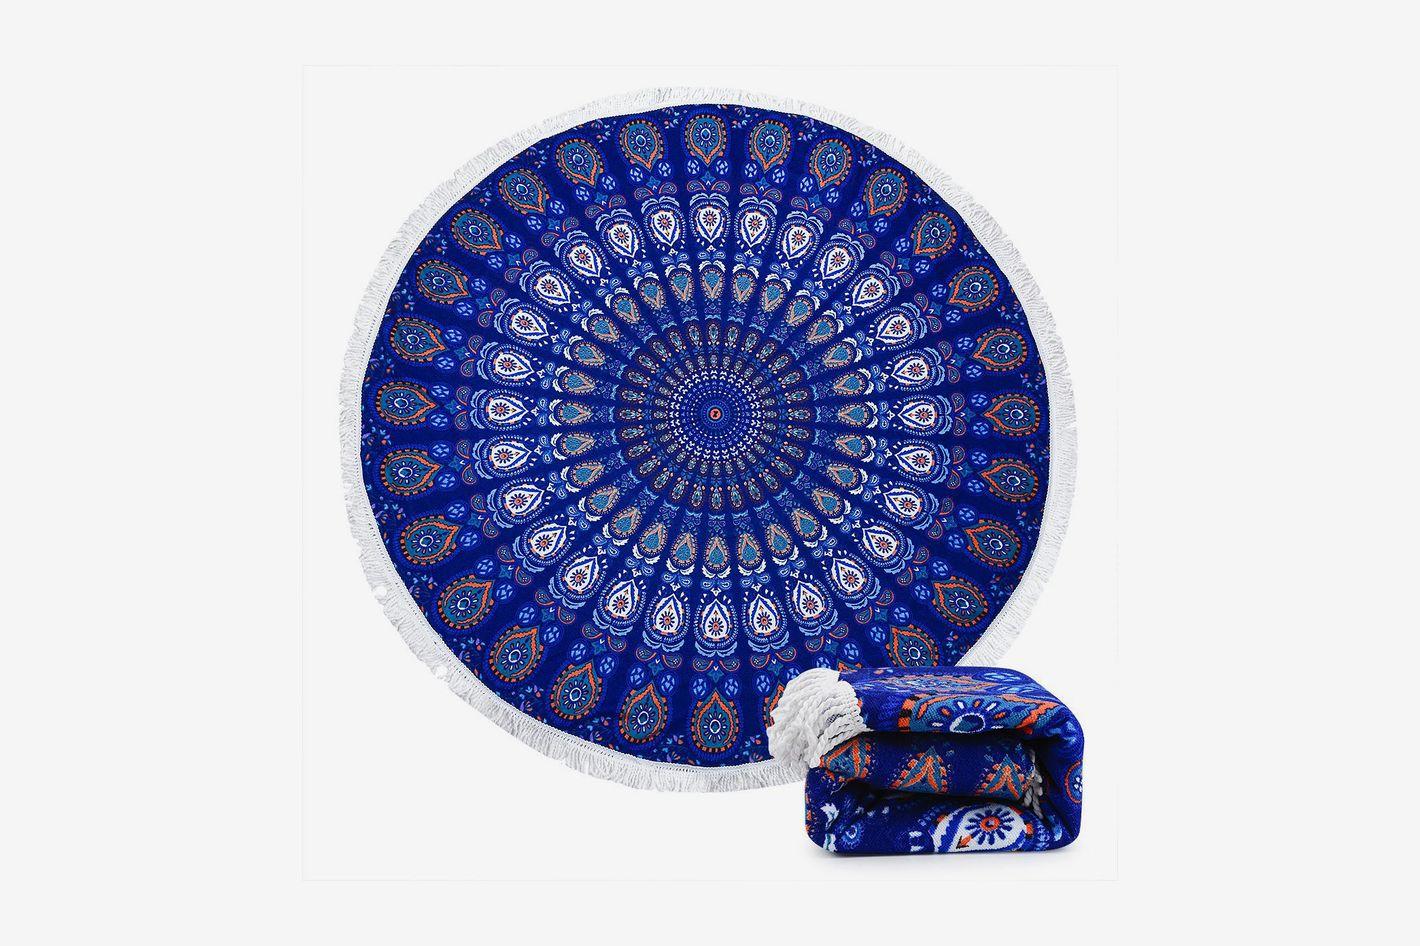 Ricdecor Indian Mandala Microfiber Large Round Beach Blanket With Tassels